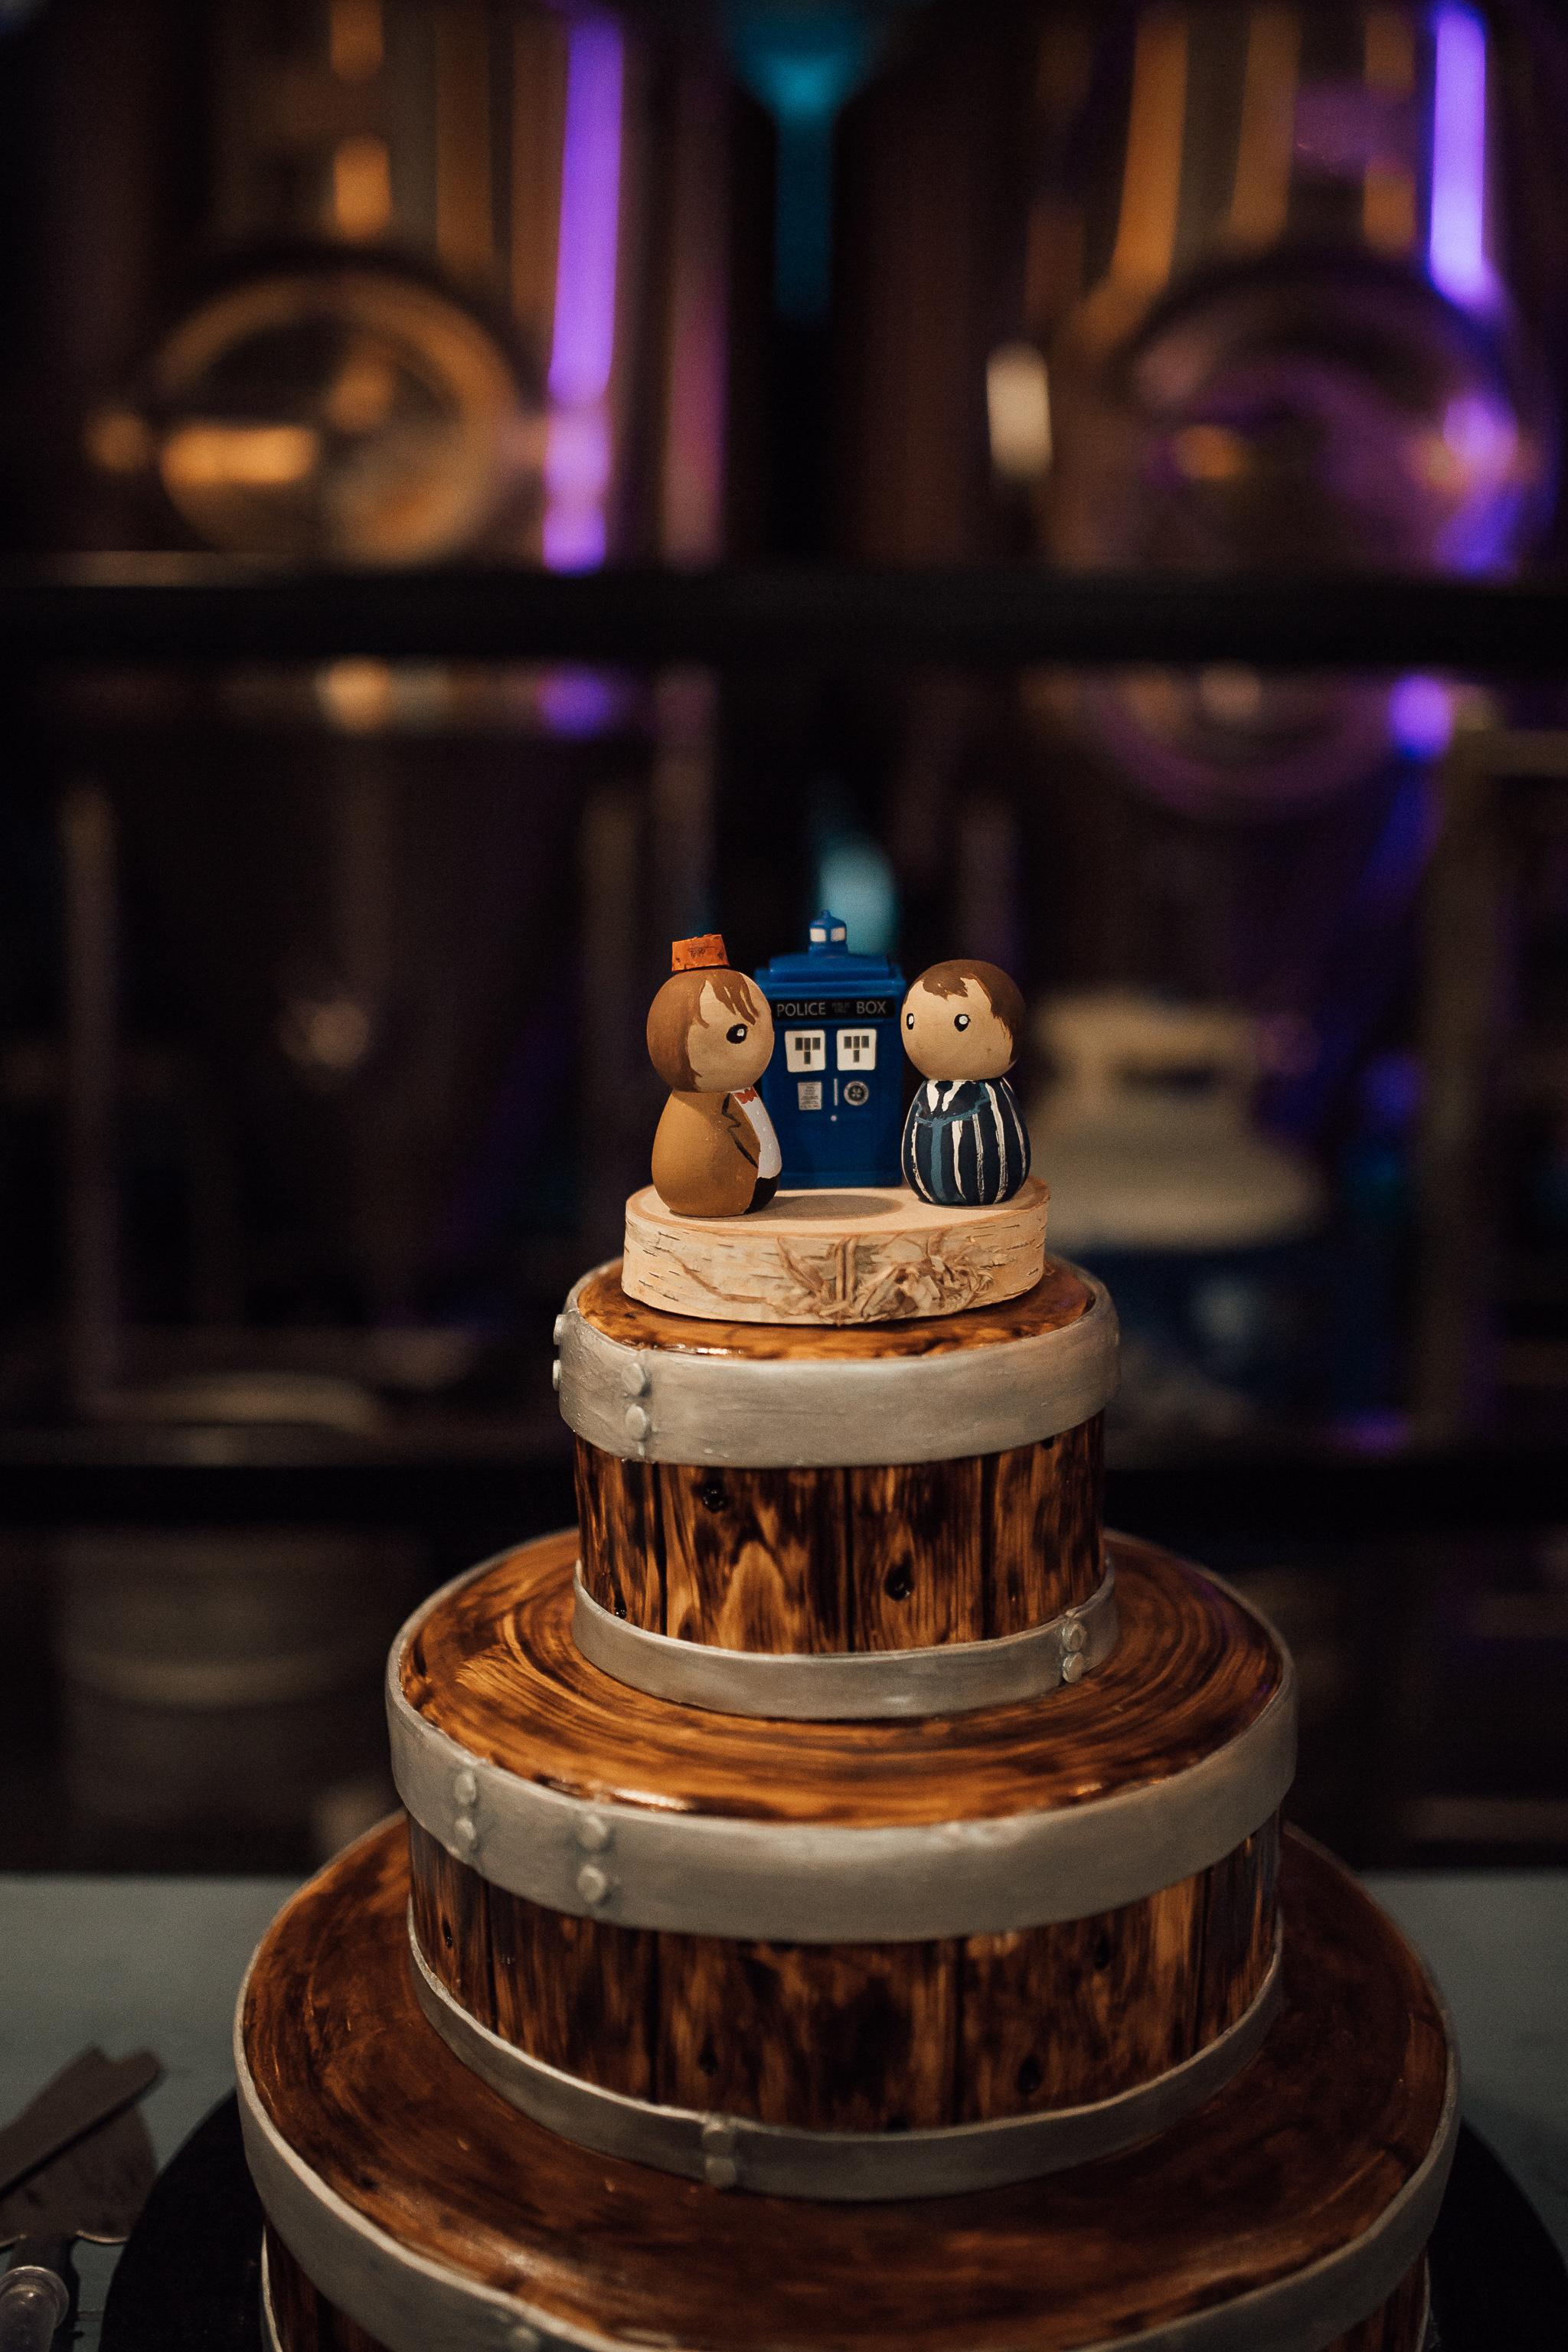 memphis-wedding-photographer-memphis-made-memphis-wedding-venue-cassie-cook-photography.robbie-casey